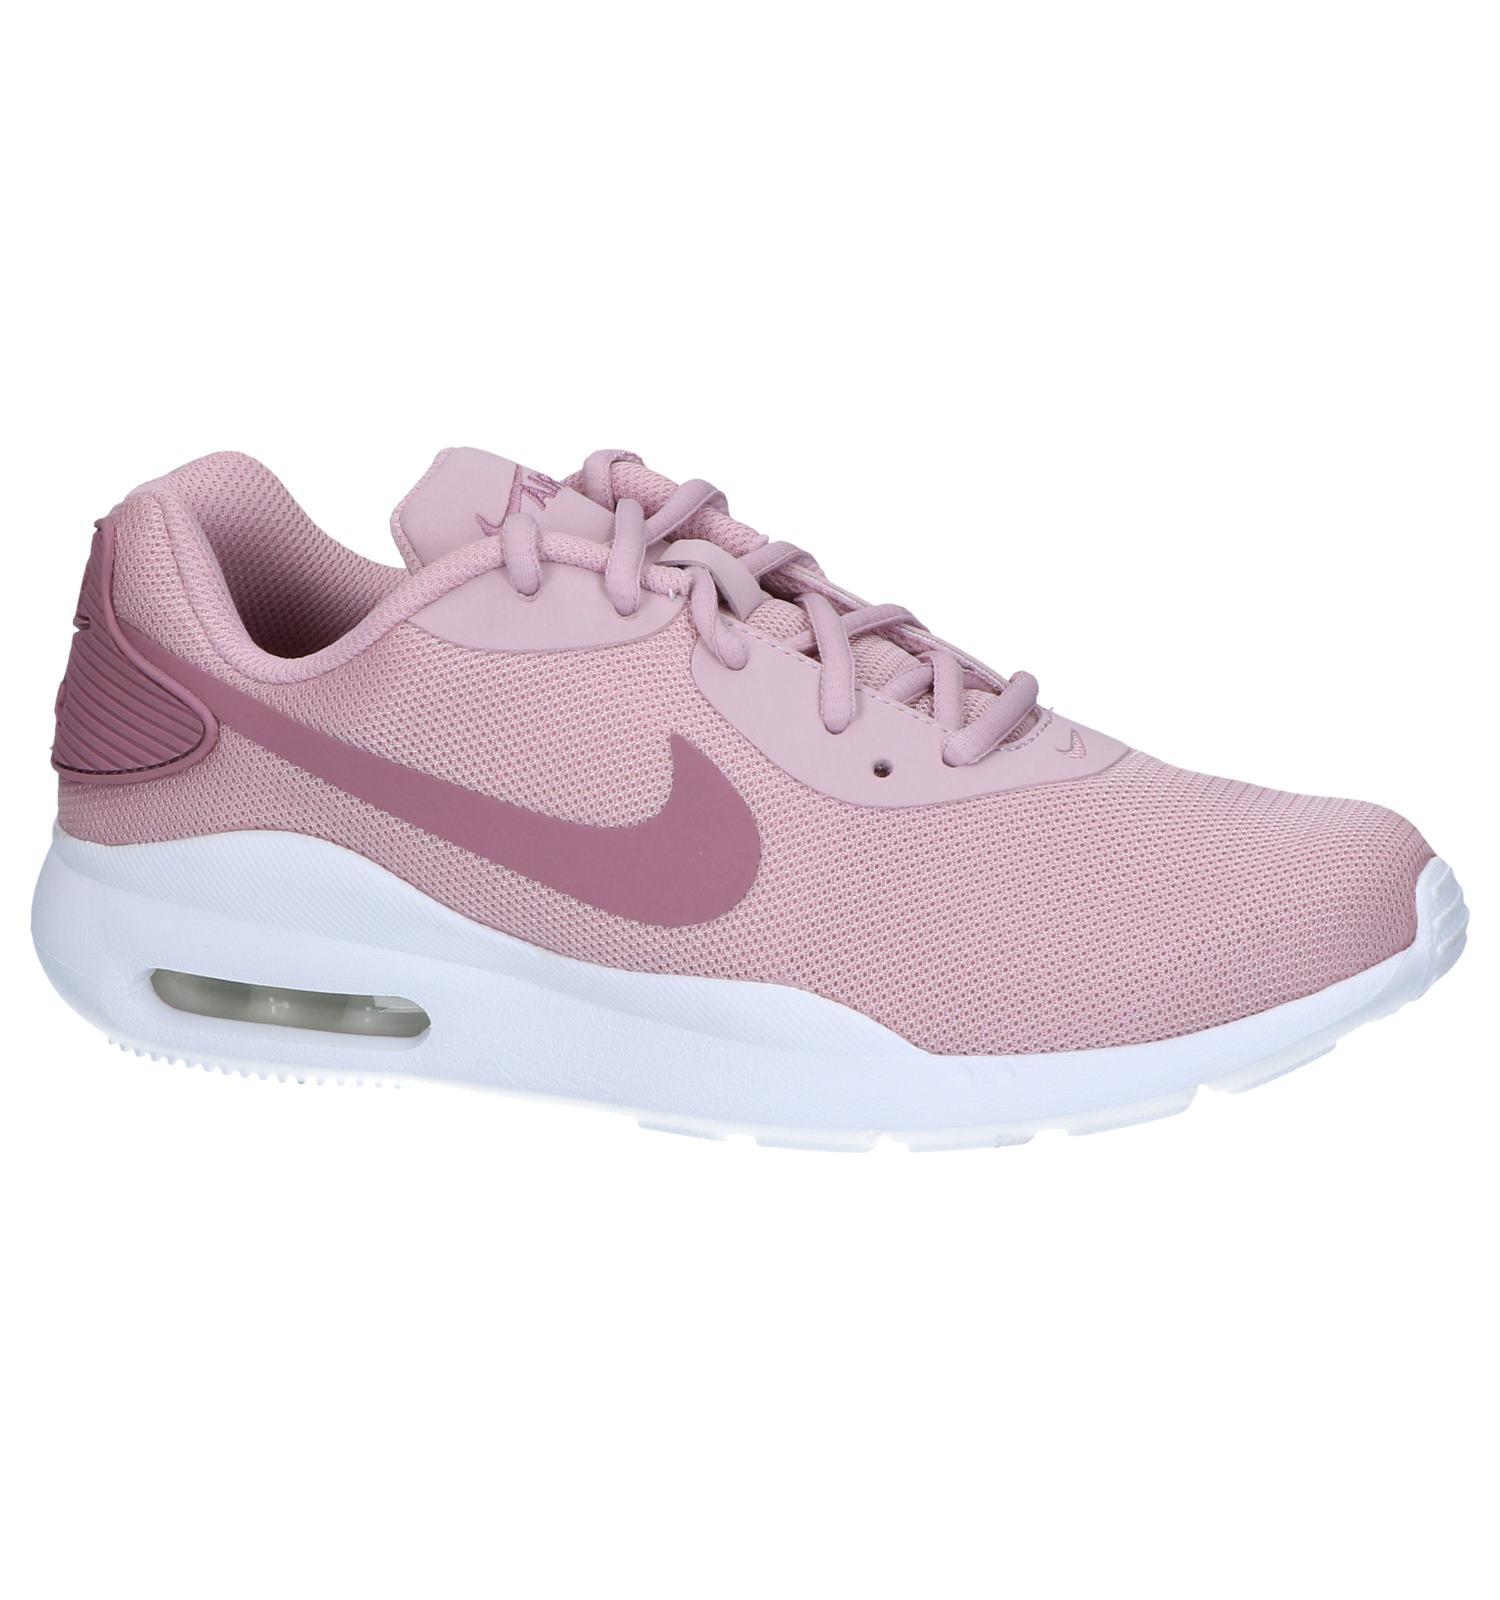 Roze Sneakers Nike Air Max Oketo | SCHOENENTORFS.NL | Gratis verzend en retour